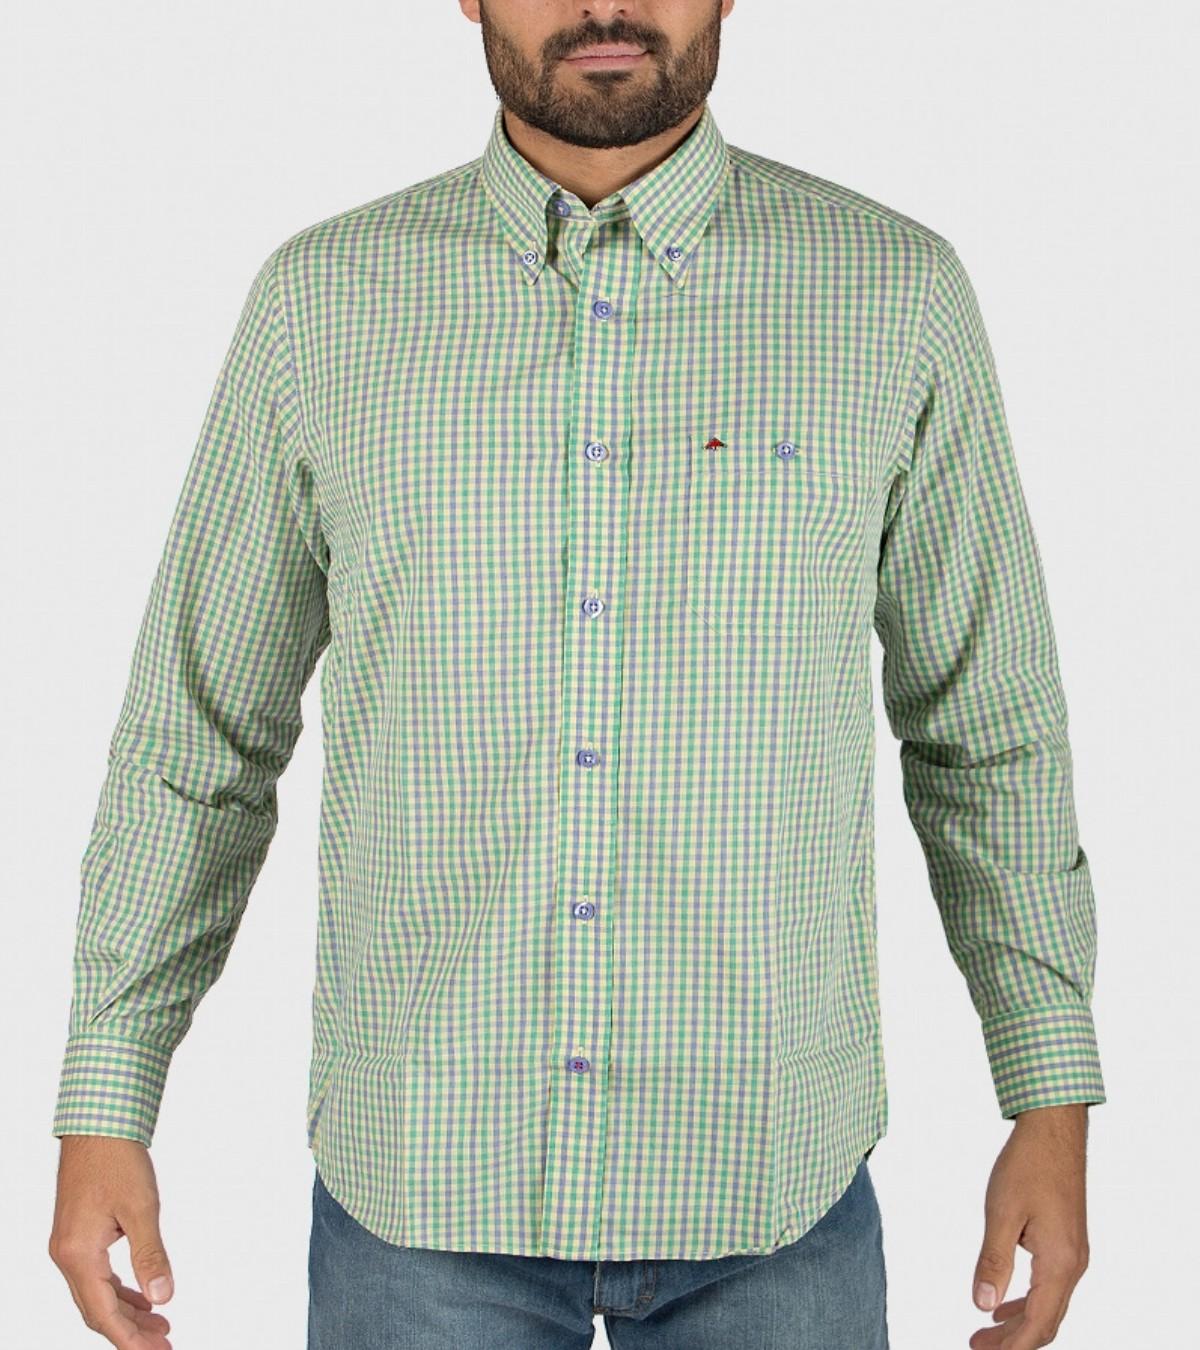 ac55123054 Camisa de hombre Carson M L